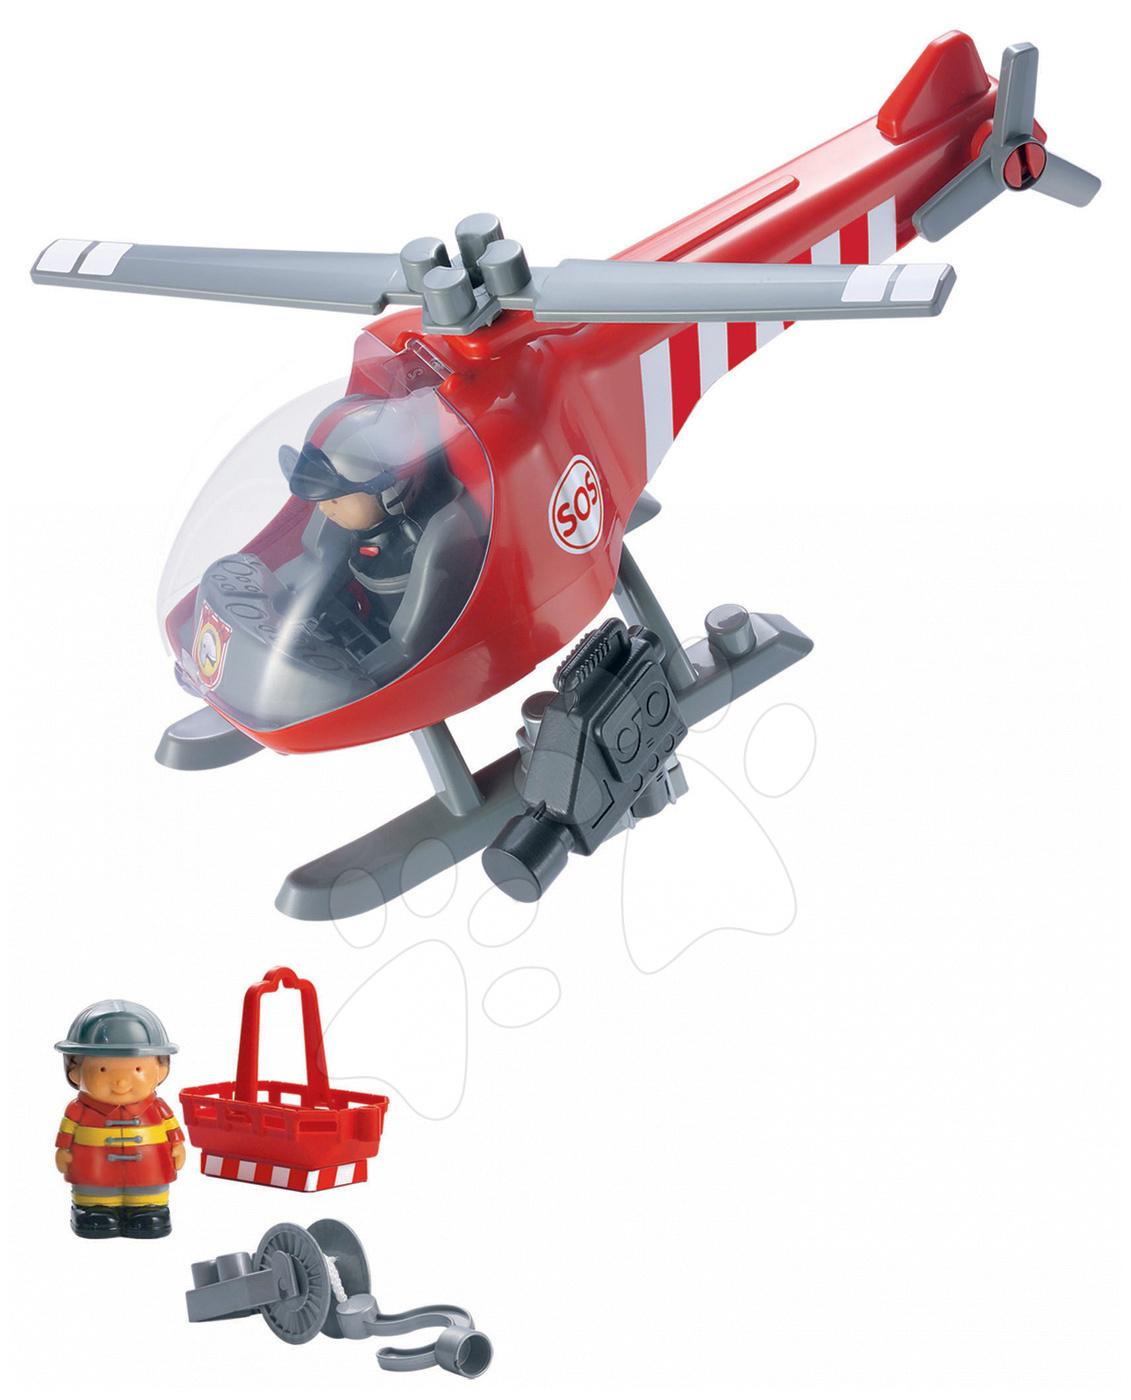 Stavebnica Abrick Záchranárska helikoptéra Écoiffier od 18 mes